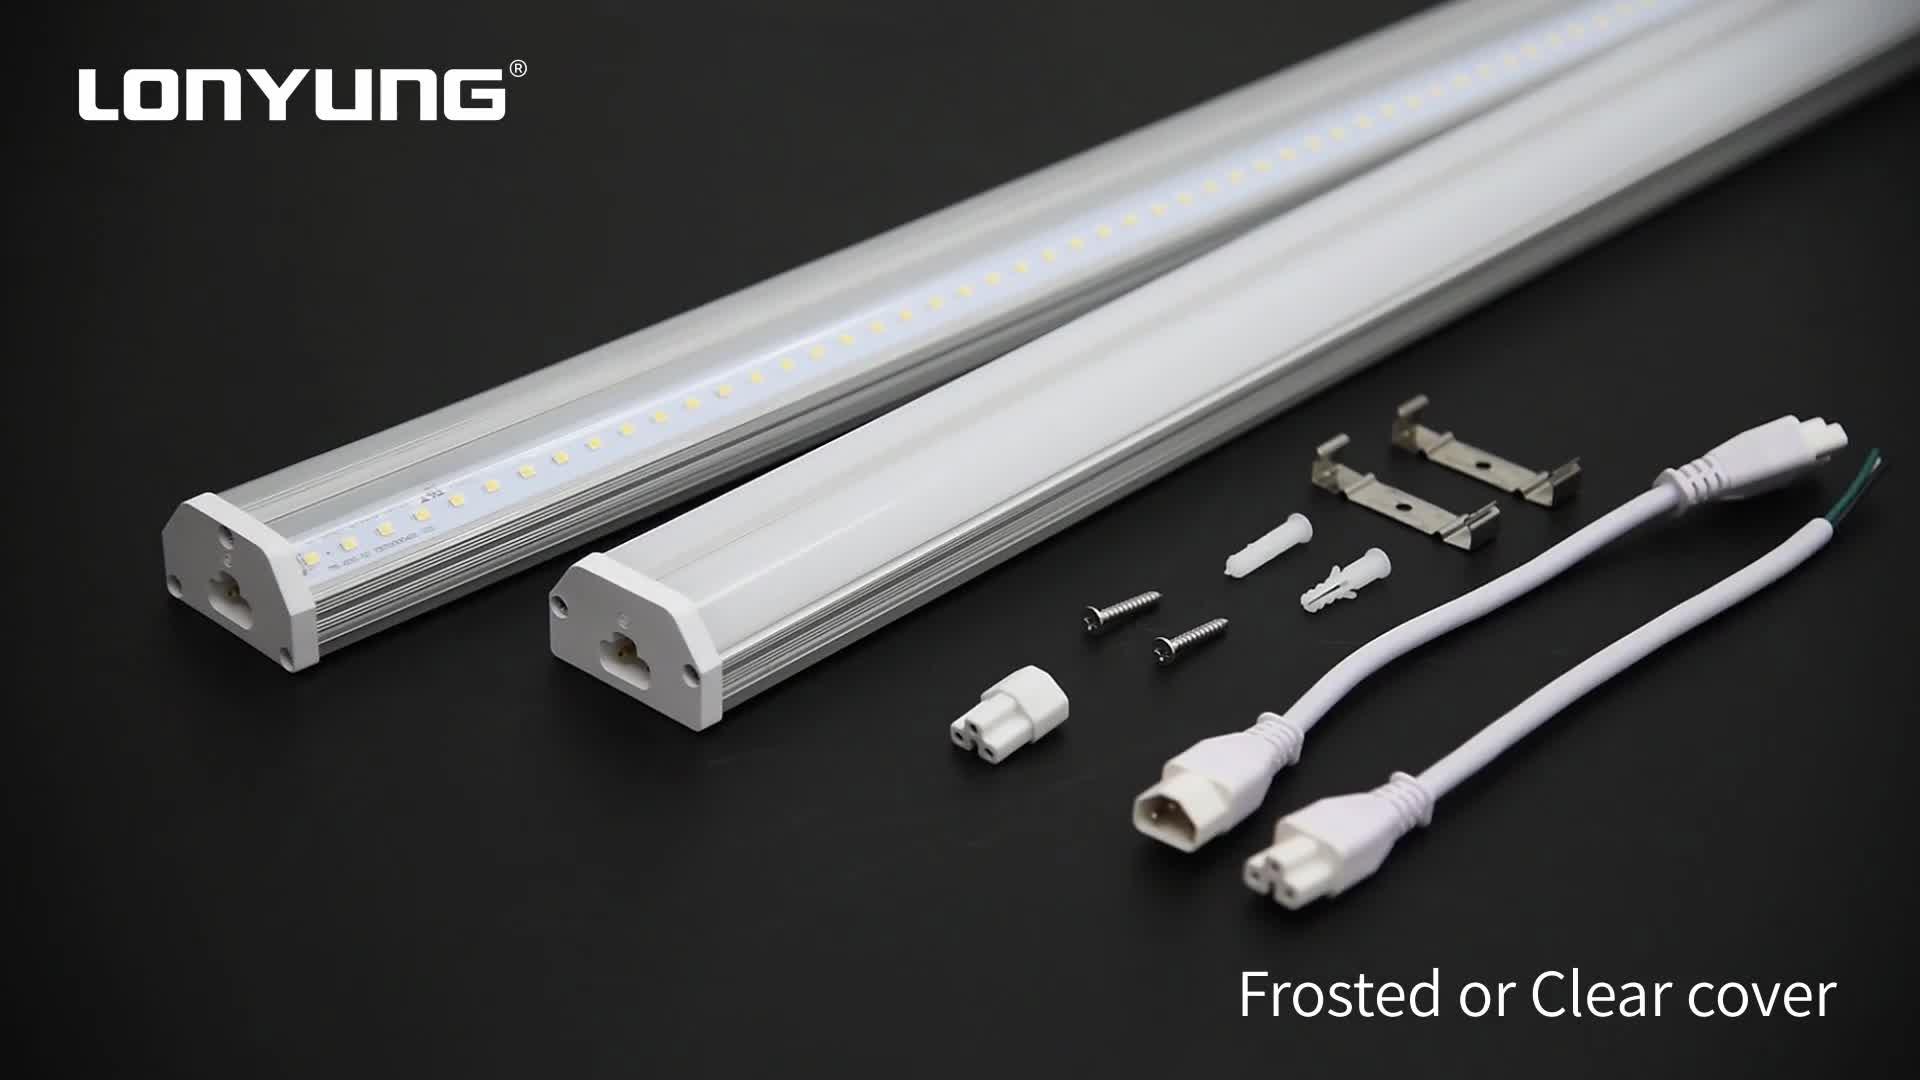 Linkable ETL CE SAA double T5  tube shop light 110lm/w t5 strip light led fixture 300mm-2400mm 2700-6500k t5 fluorescent lamp